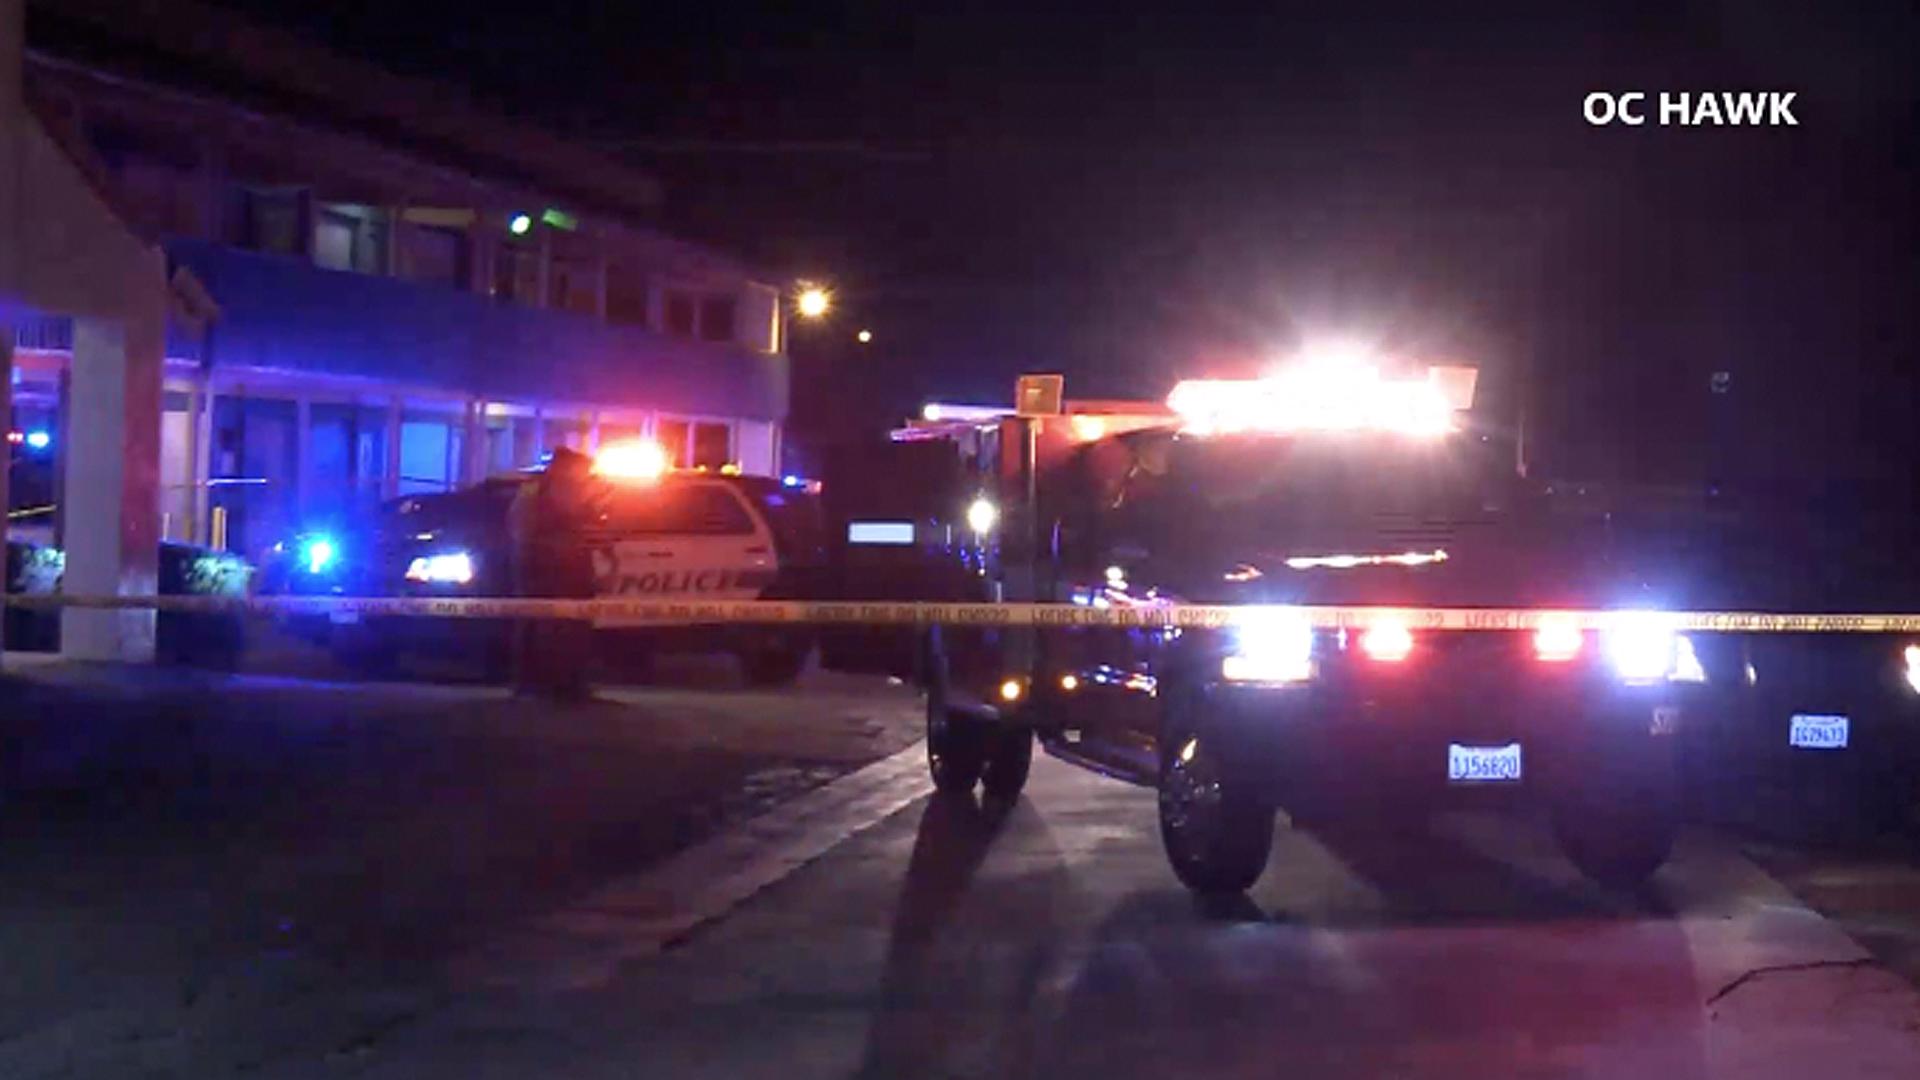 Authorities investigate a death in San Jacinto on Oct. 9, 2019. (Credit: OC Hawk)